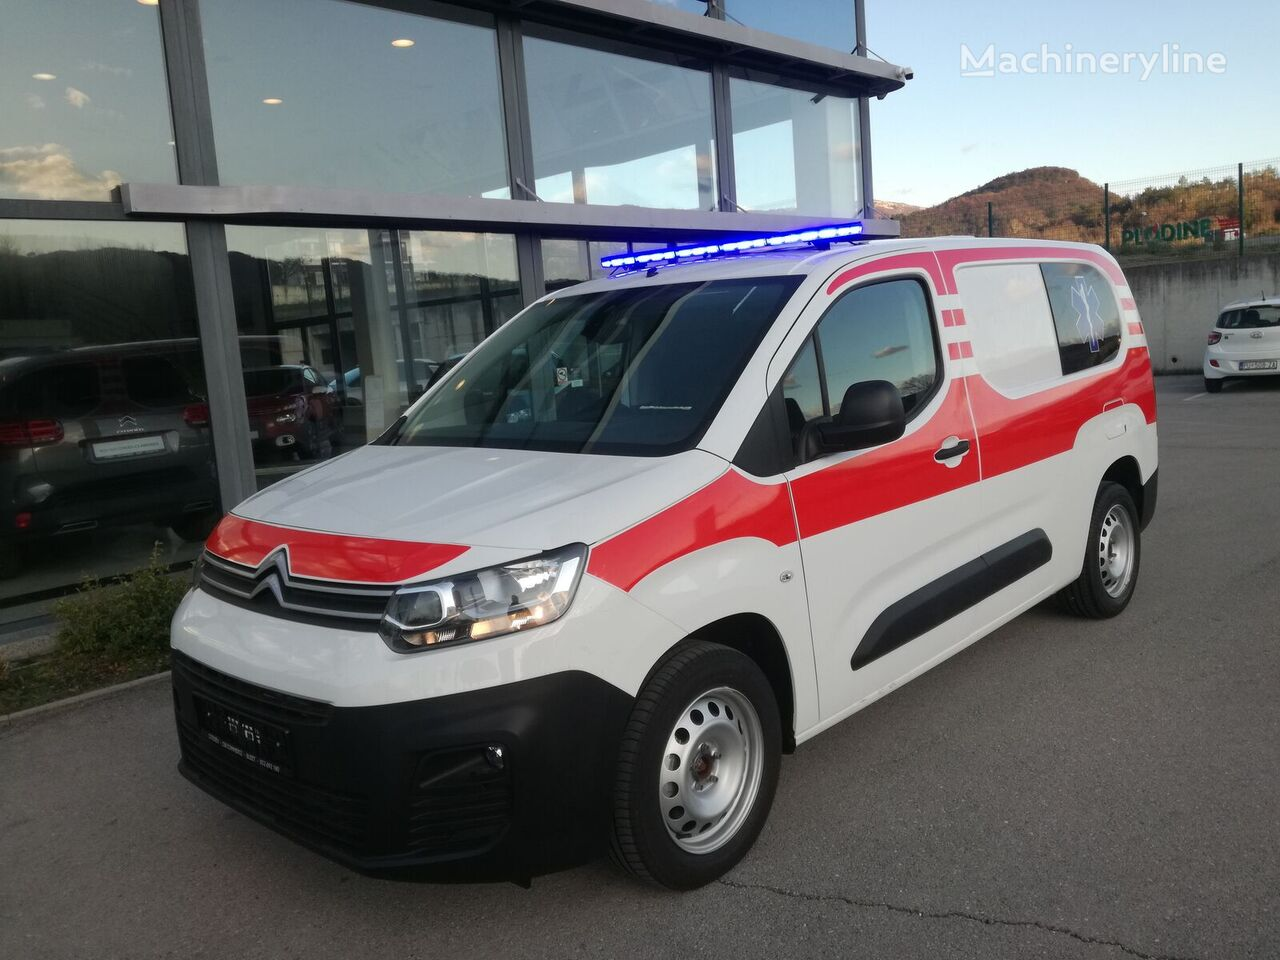 CITROEN Berlingo XL ambulancia nueva